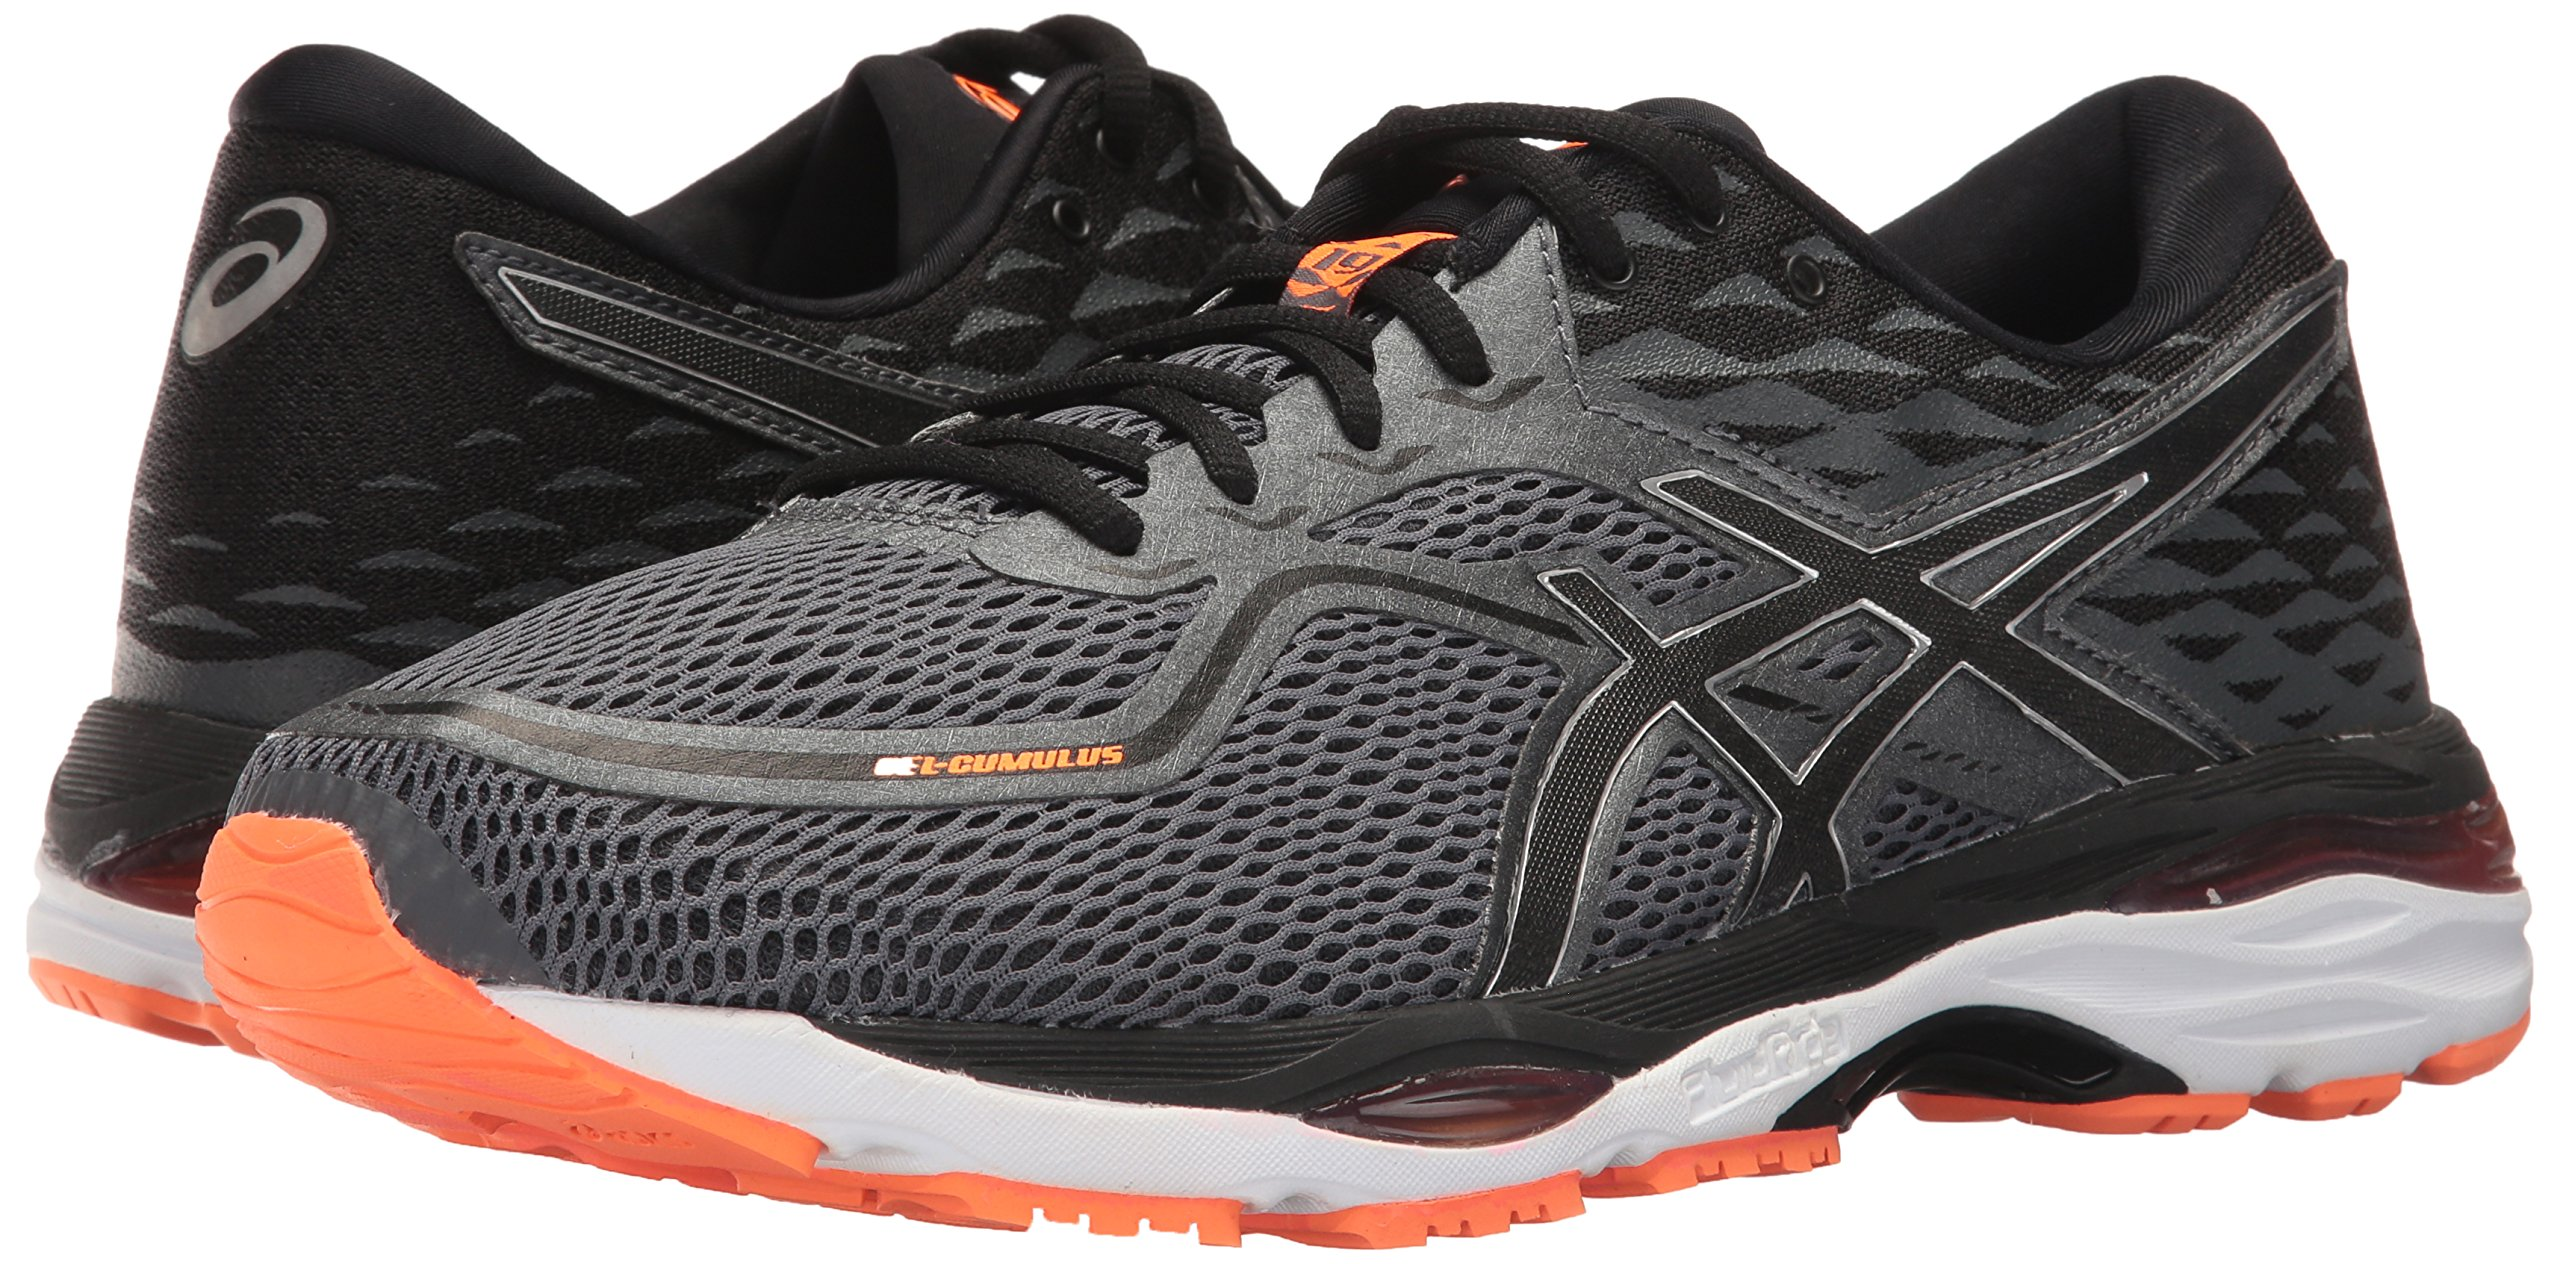 ASICS Mens Gel-Cumulus 19 Running Shoe, Carbon/Black/Hot Orange, 6.5 Medium US by ASICS (Image #6)